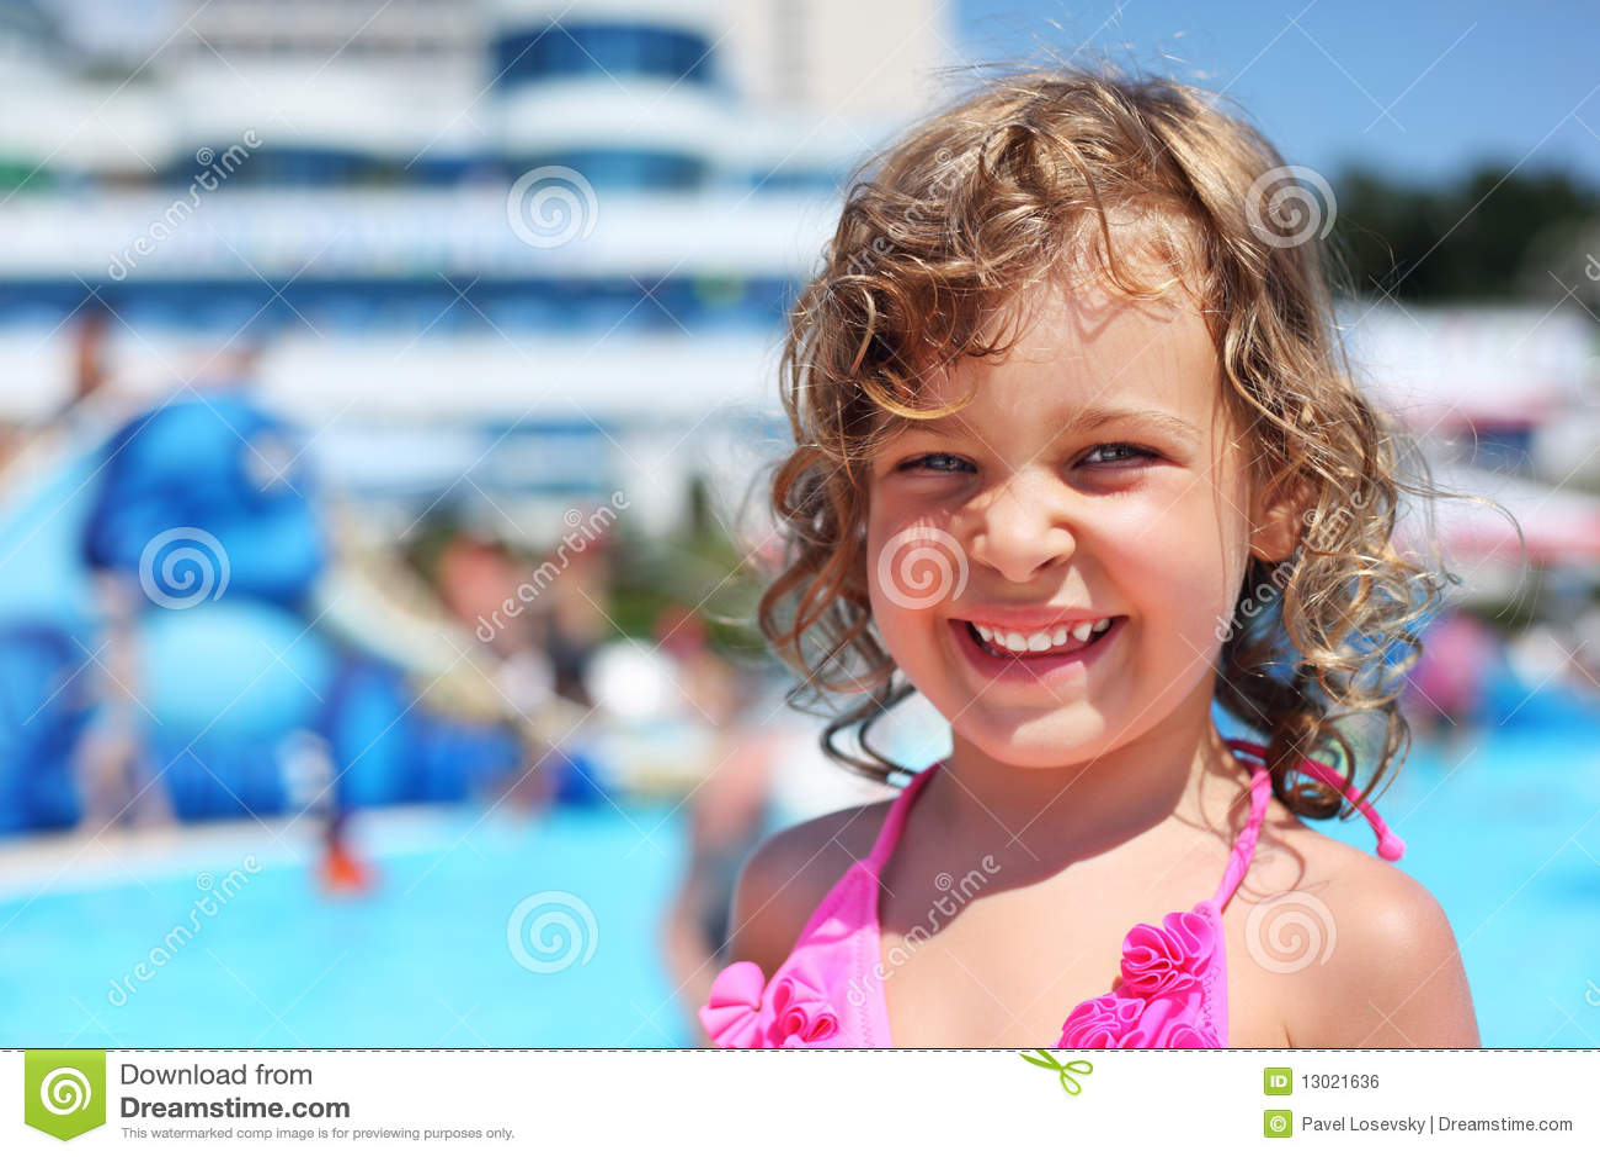 Little girl near pool in aquapark